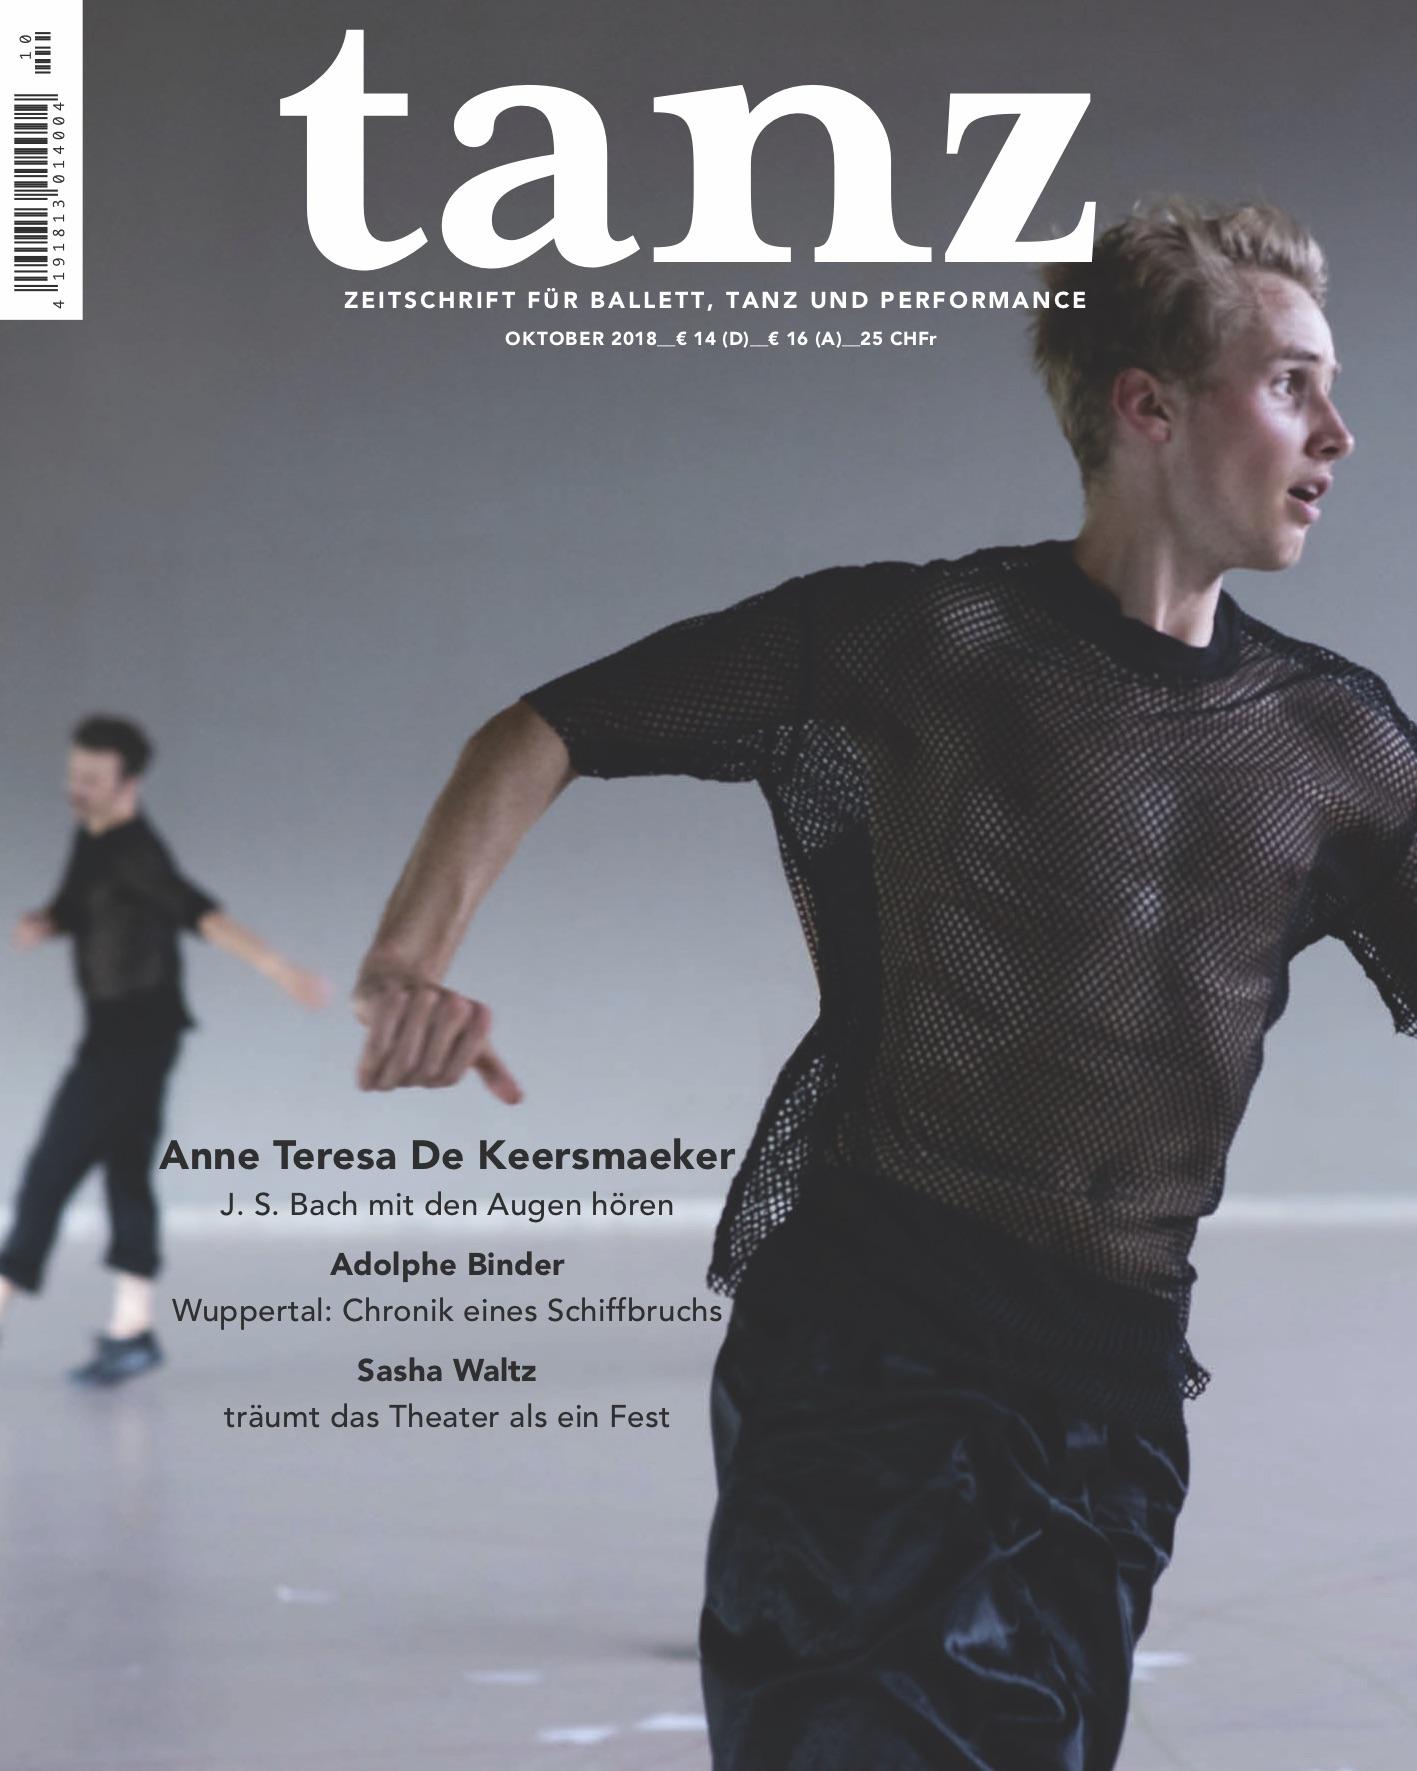 tanz Oktober (10/2018)